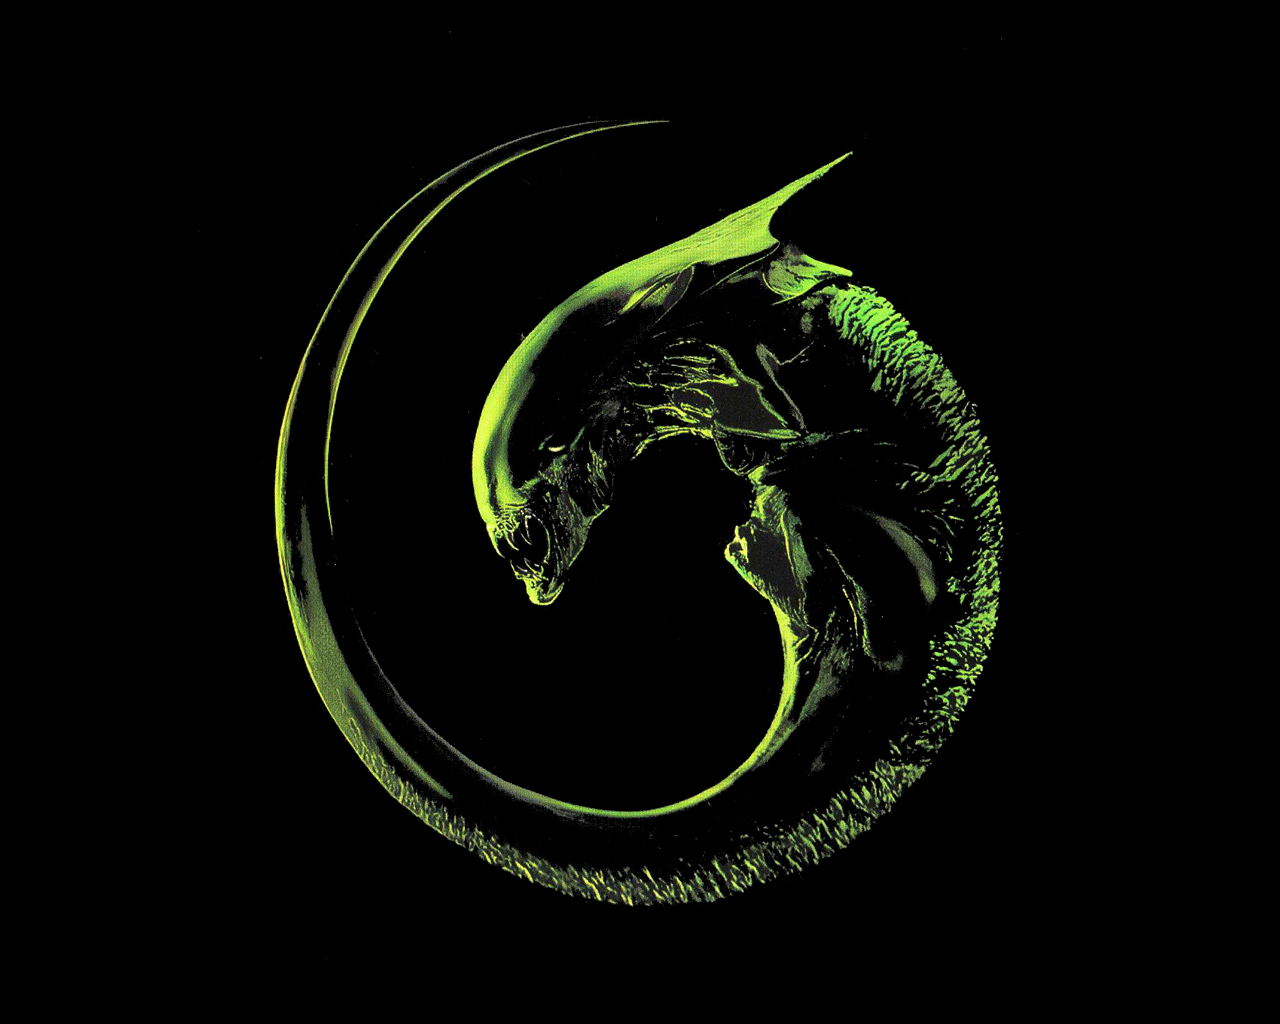 Movies Aliens Wallpaper 1280x1024 Movies Aliens Movie 1280x1024